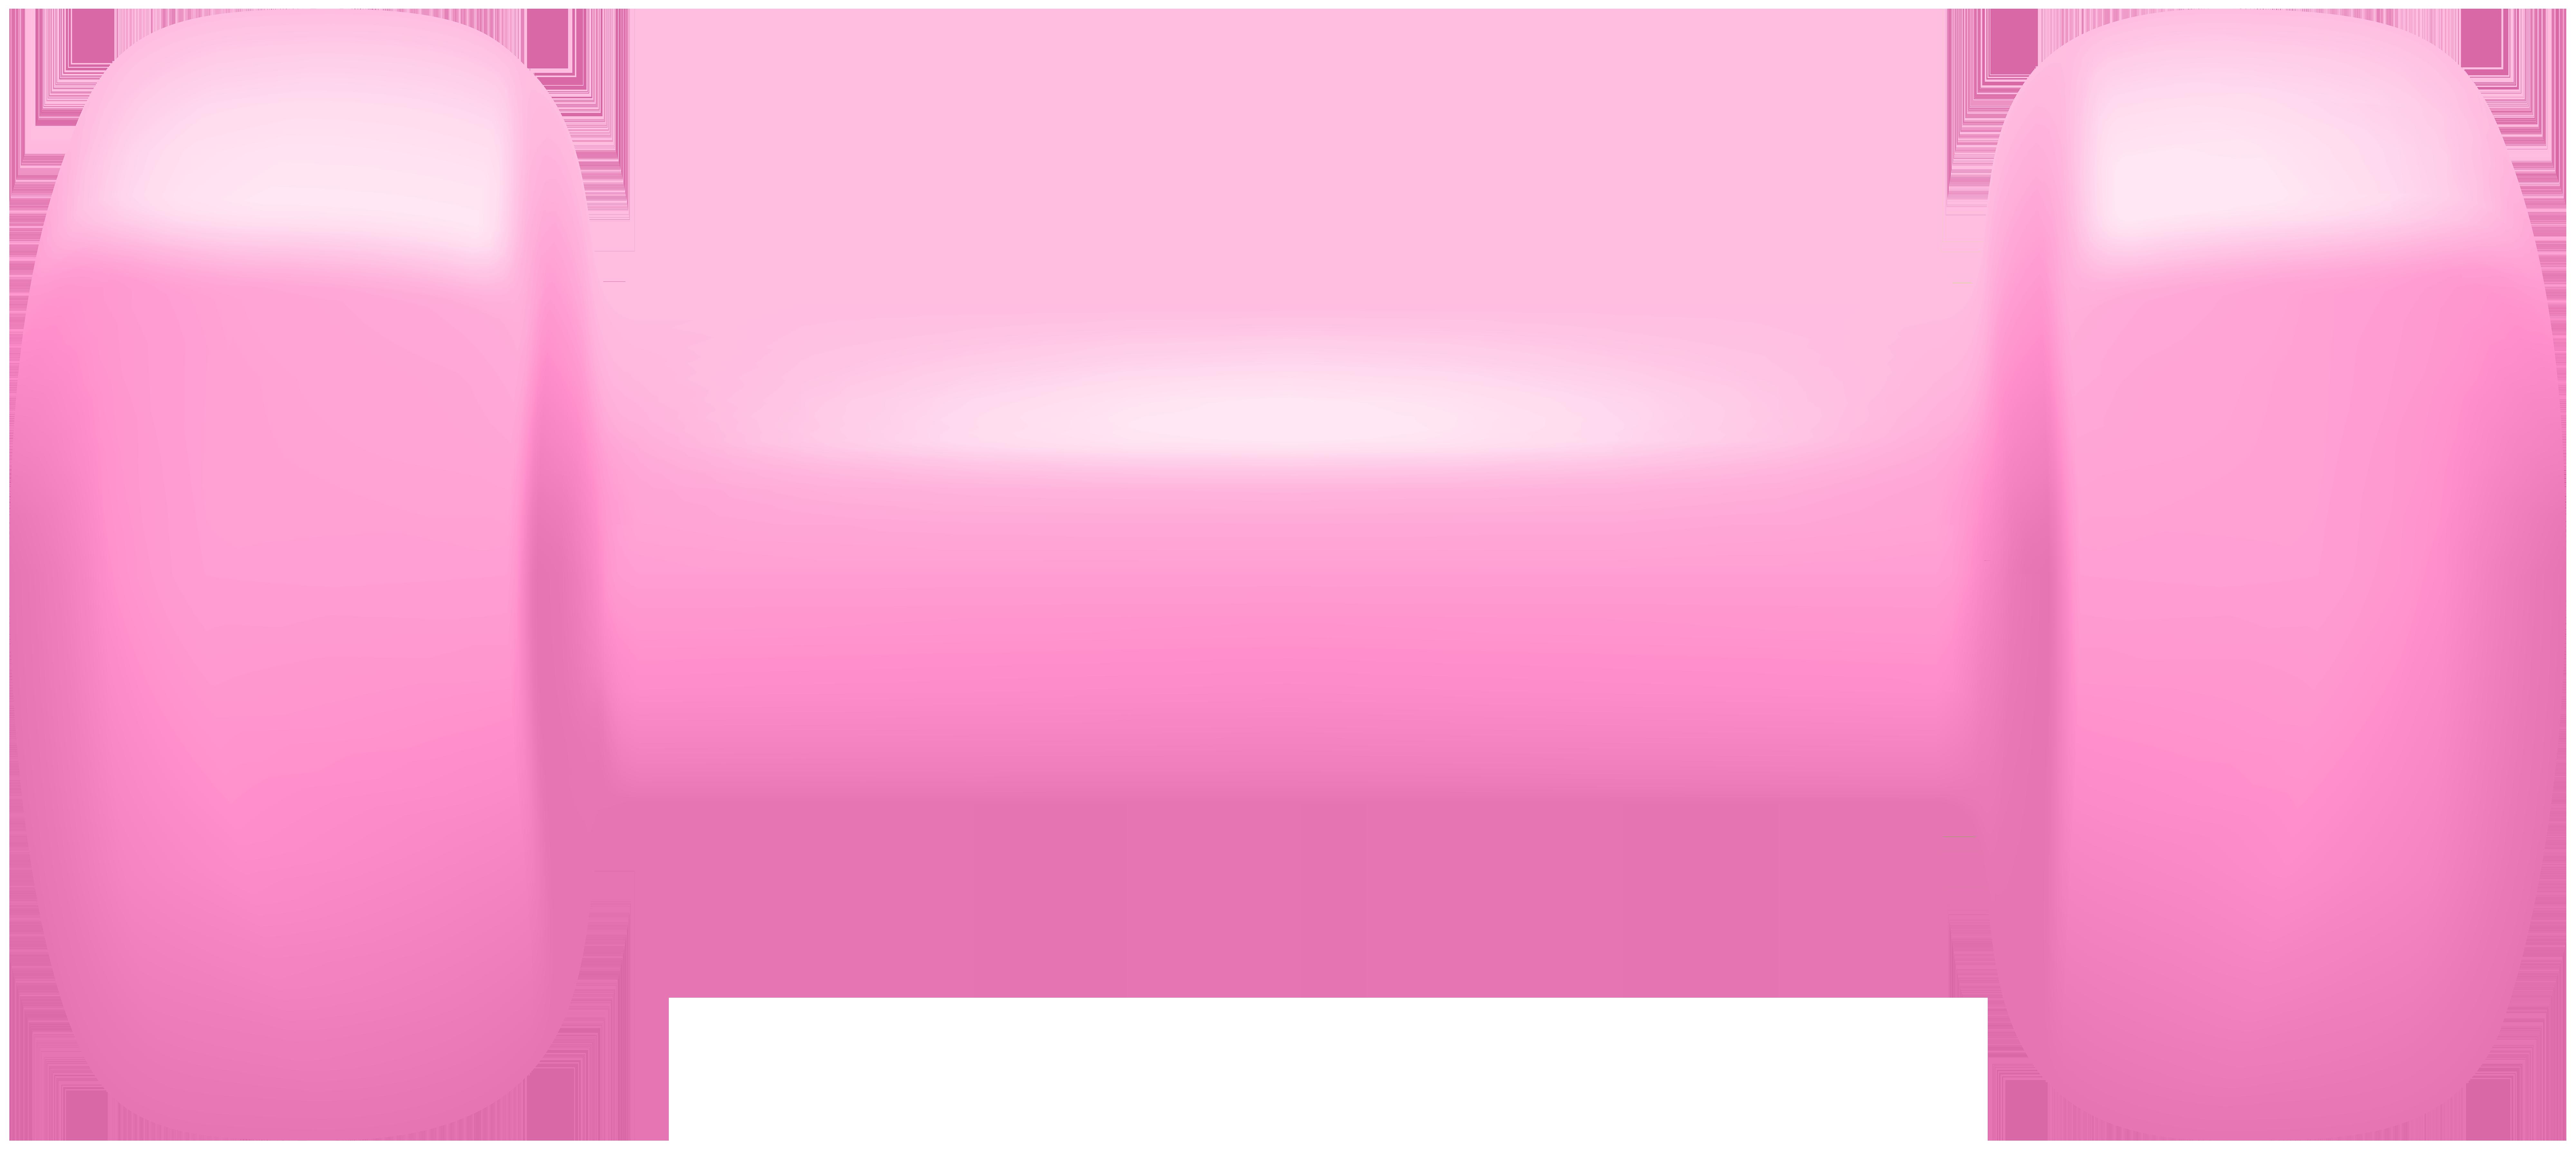 Dumbbell clipart border. Pink png clip art